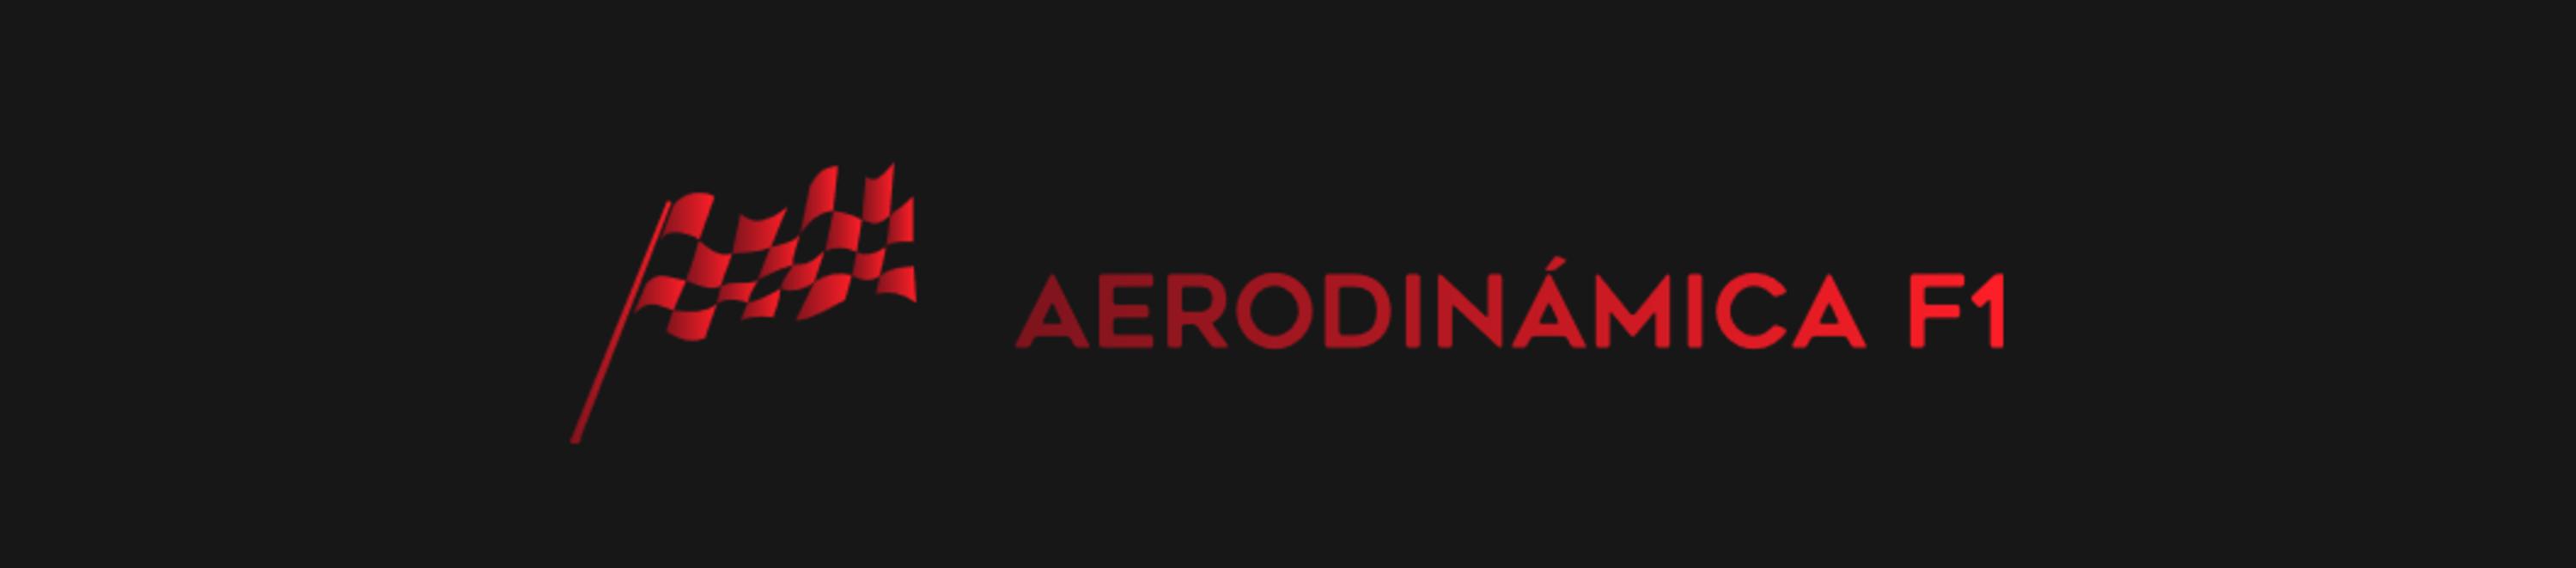 Aerodinámica F1